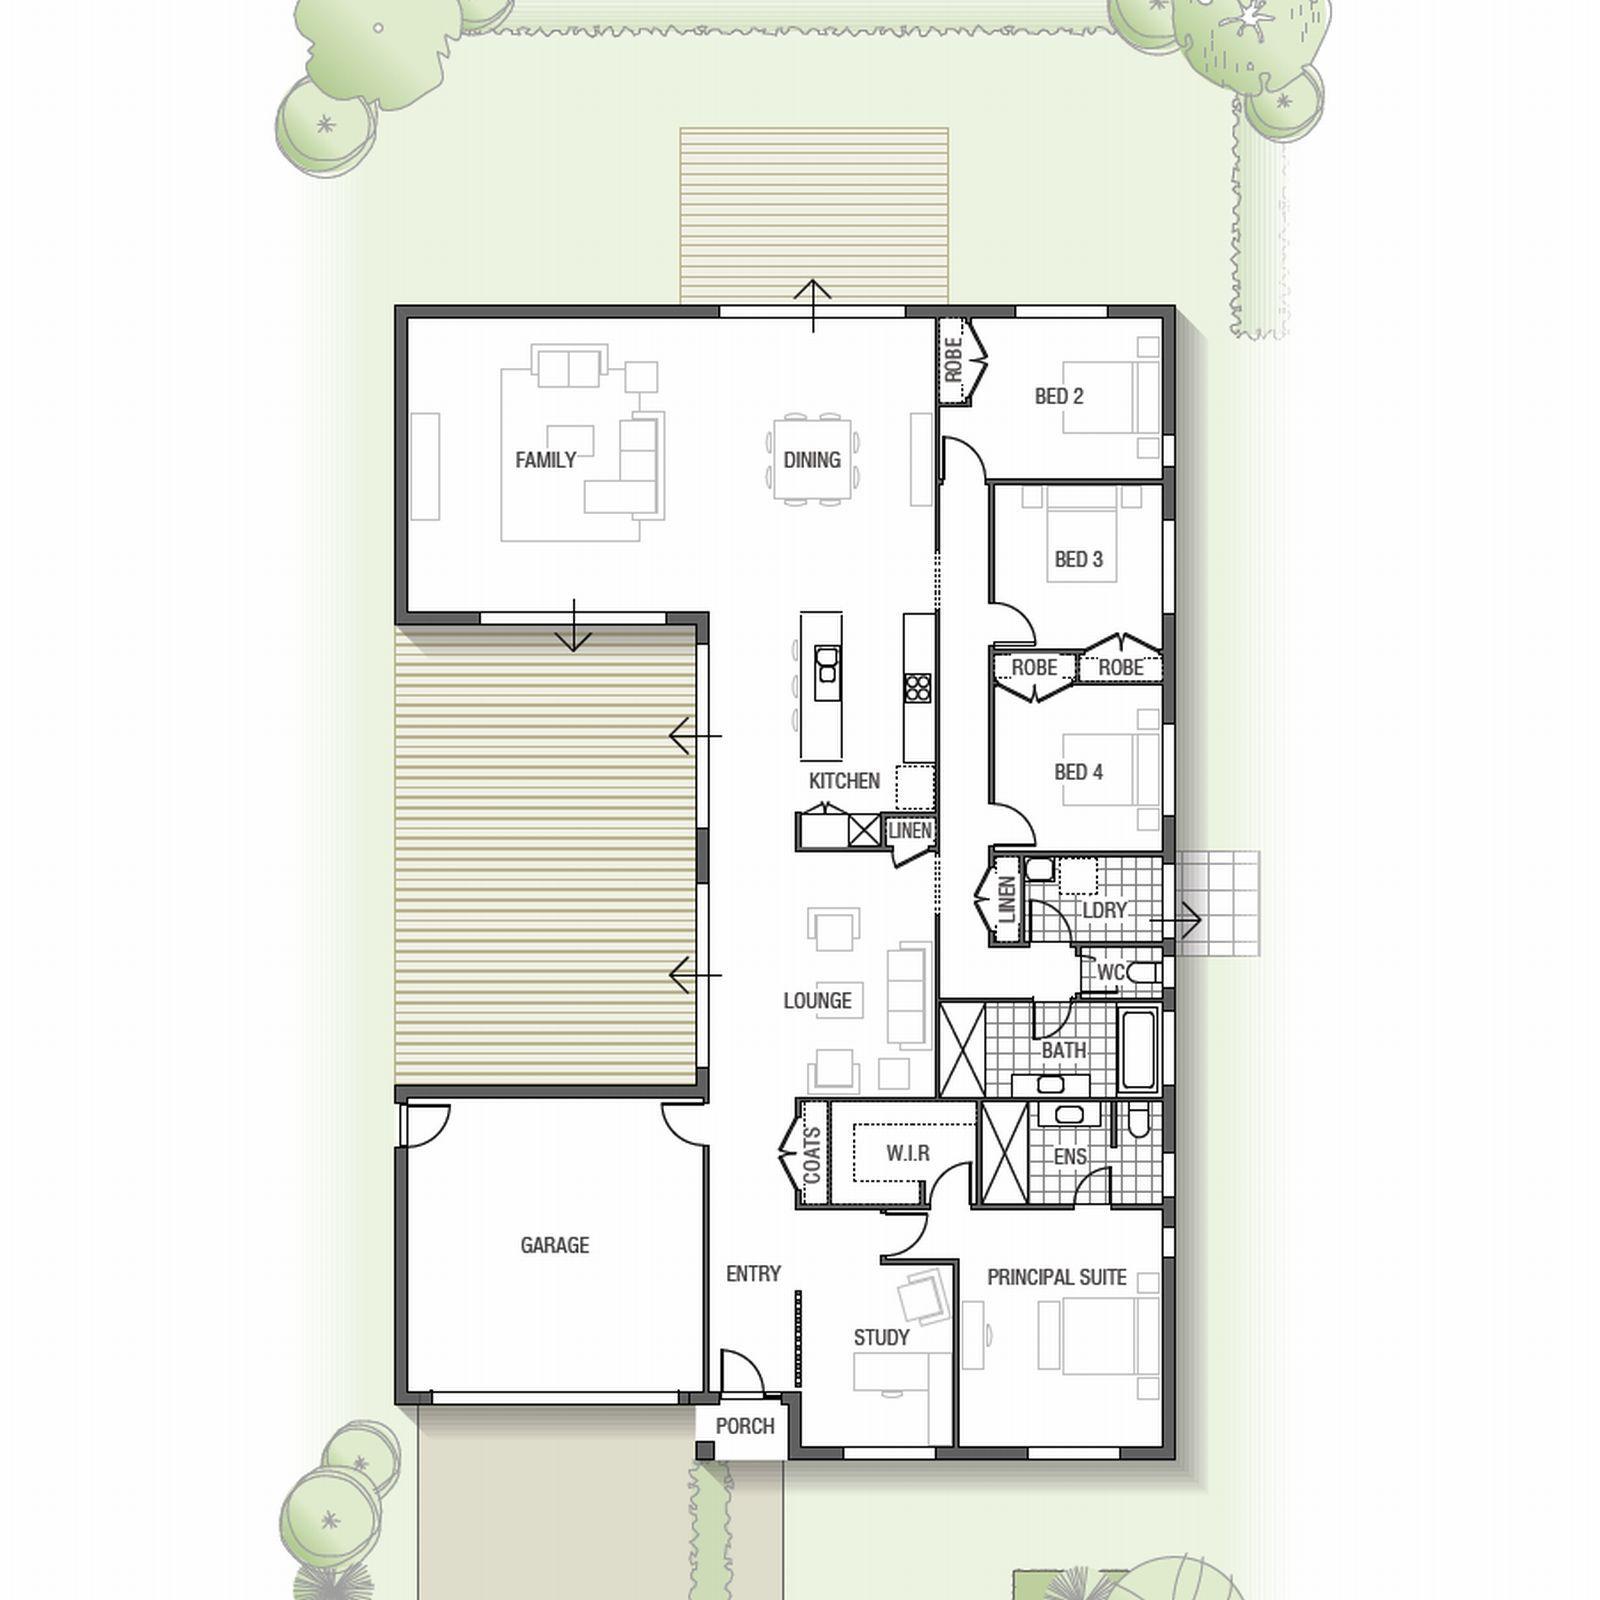 Ensuite badezimmerdesignpläne designed for comfortable family living this spacious single storey